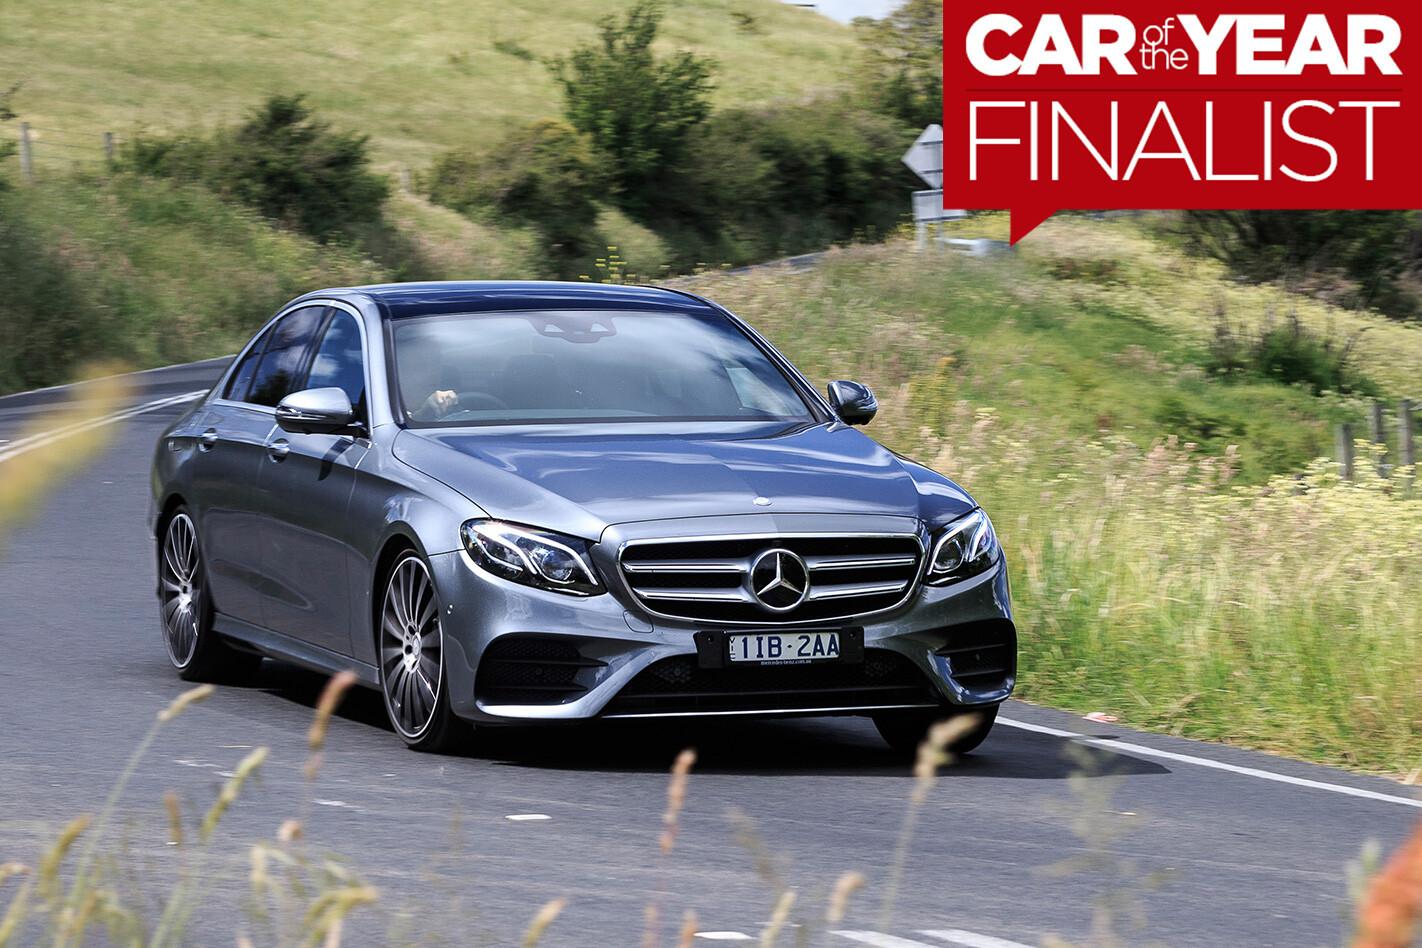 2017 Mercedes-Benz E-Class - Wheels Car of the Year